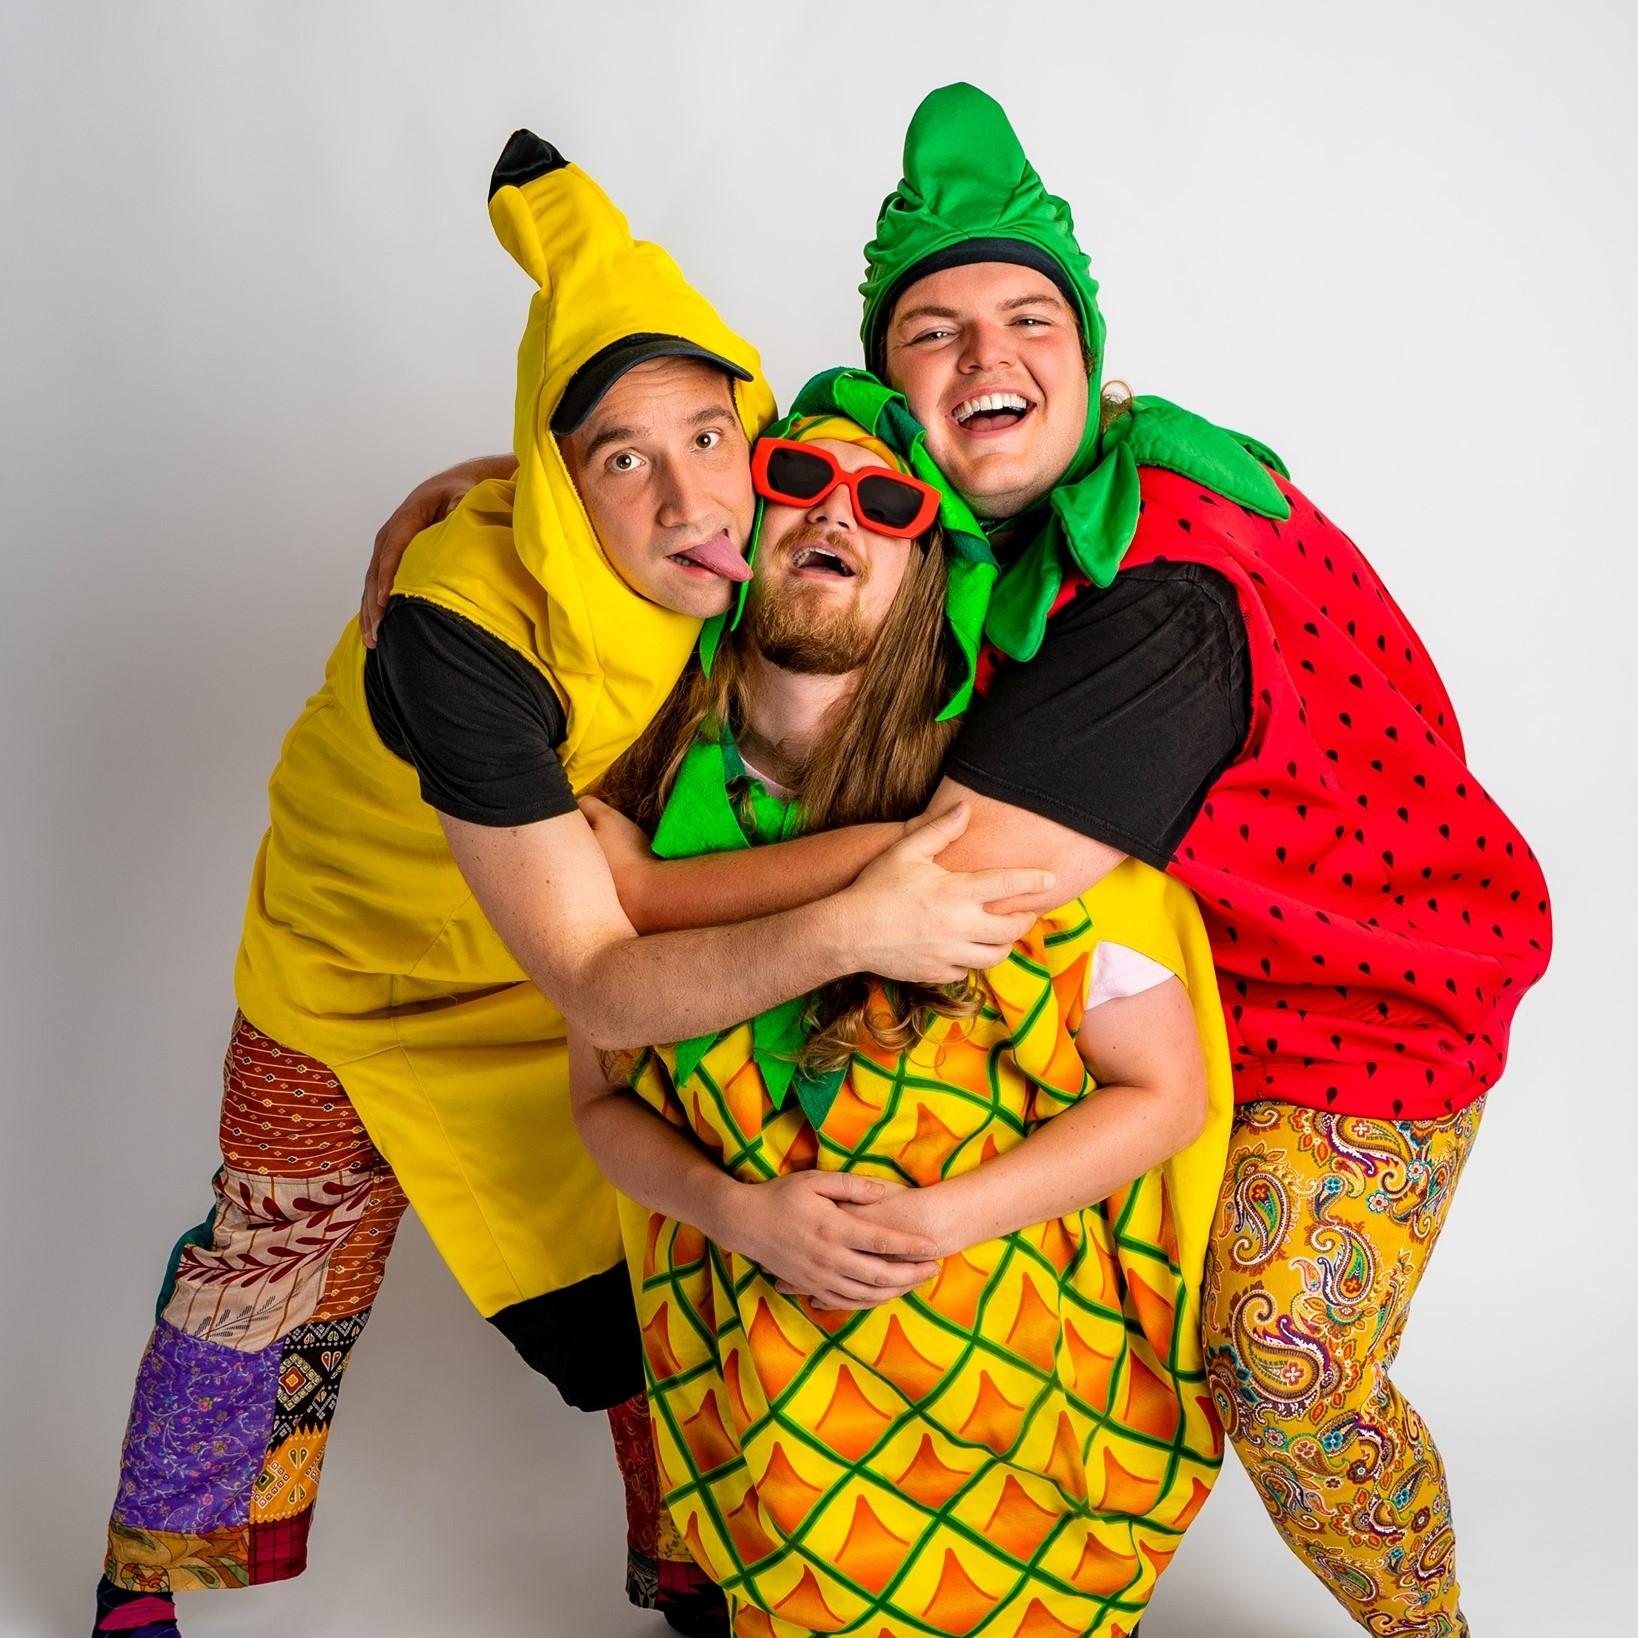 Godzukey, The Banana Creatures, Sweet N' Juicy